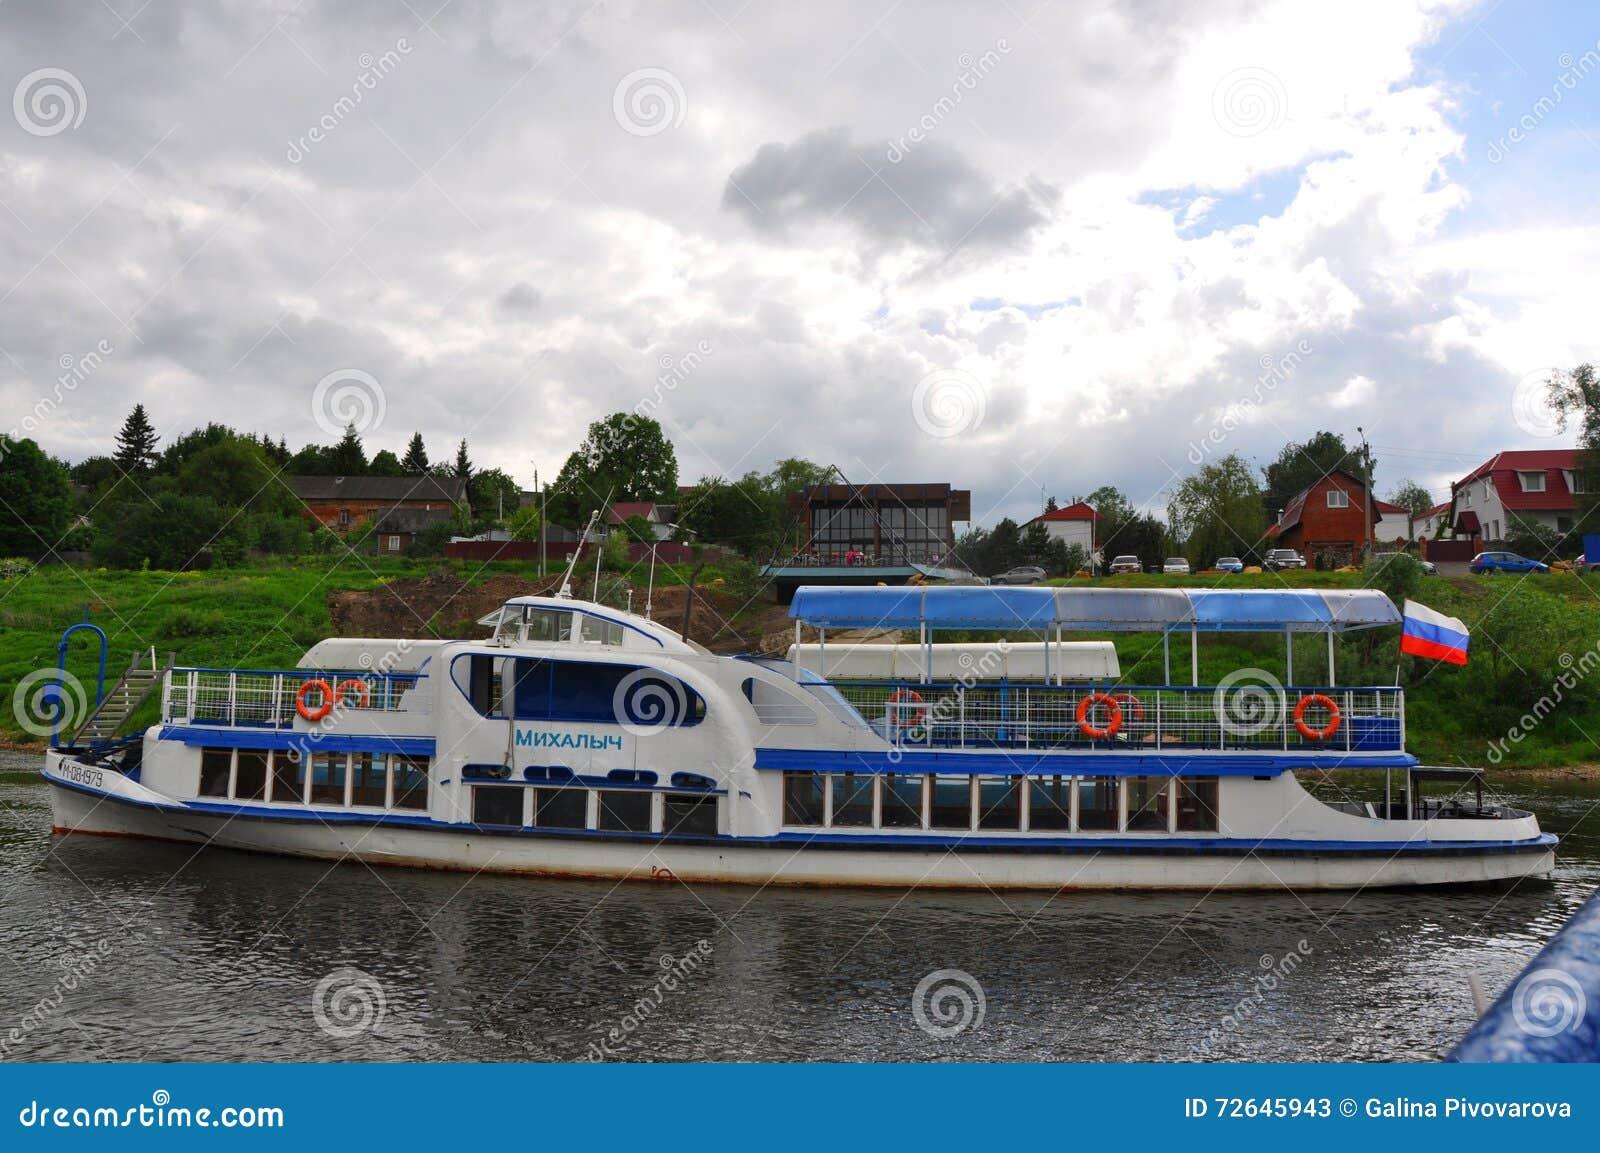 Motorship on the Oka river in Tarusa, Kaluga region, Russia